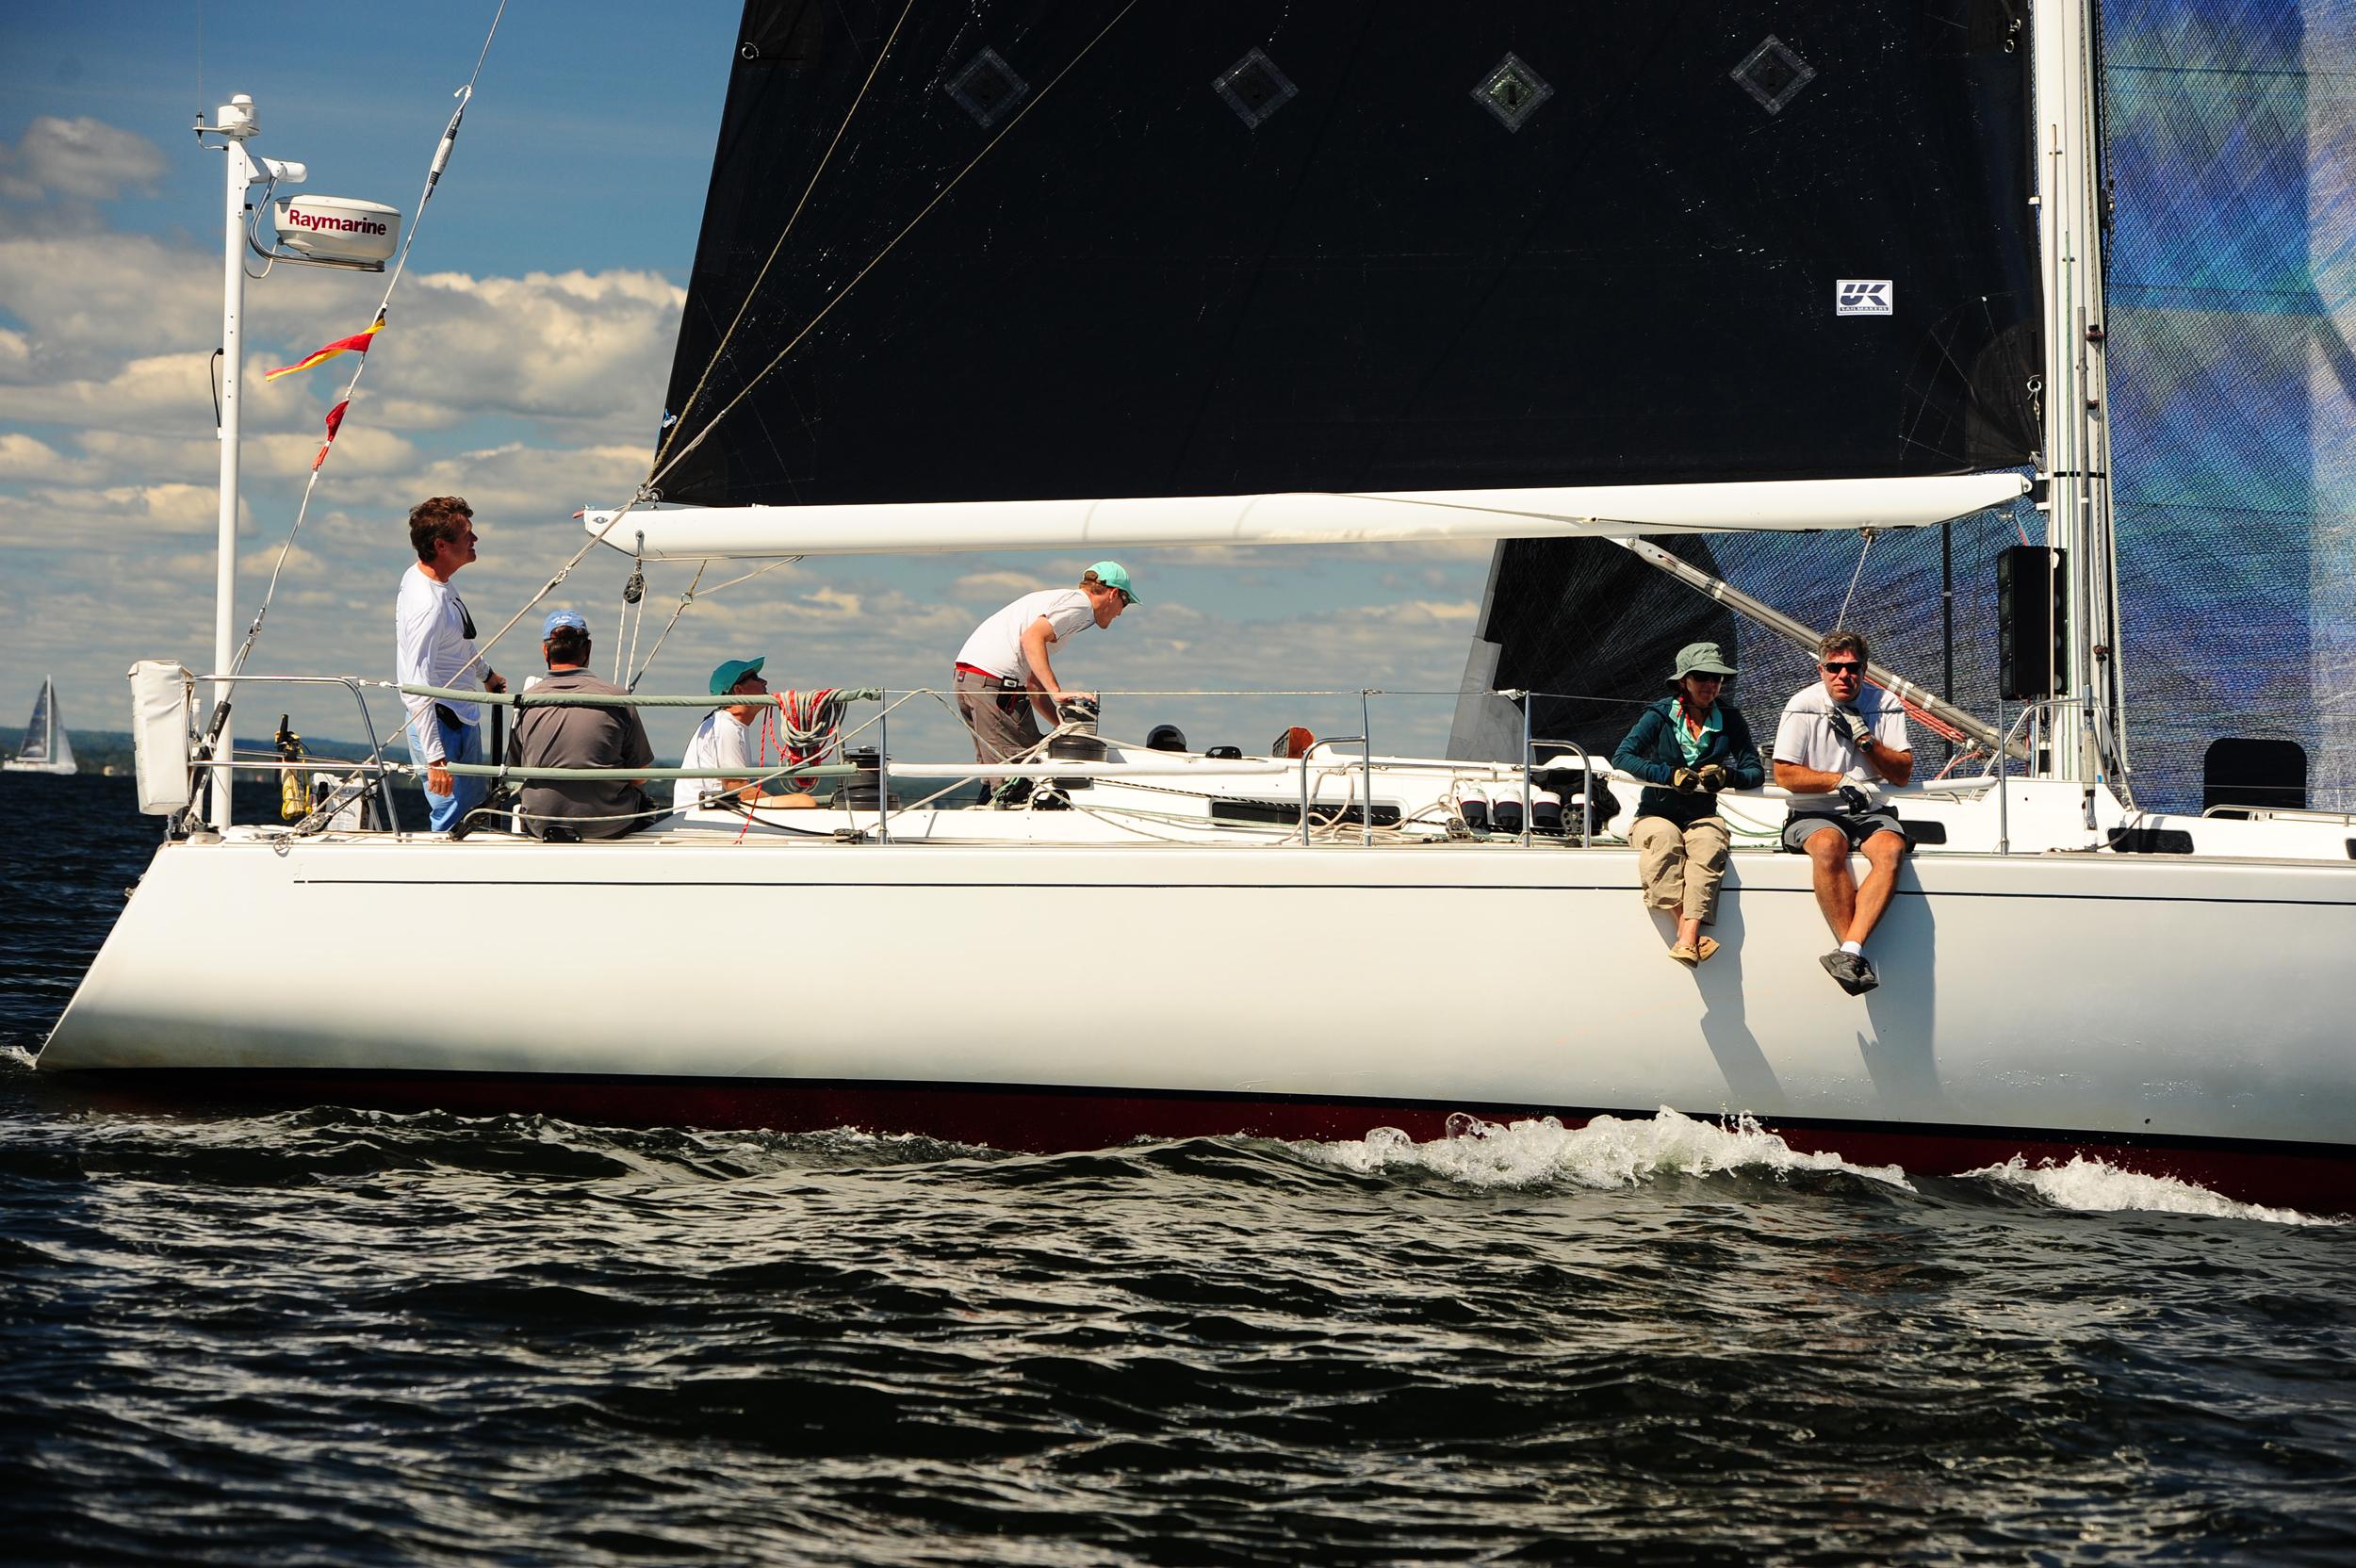 2014 Vineyard Race A 1670